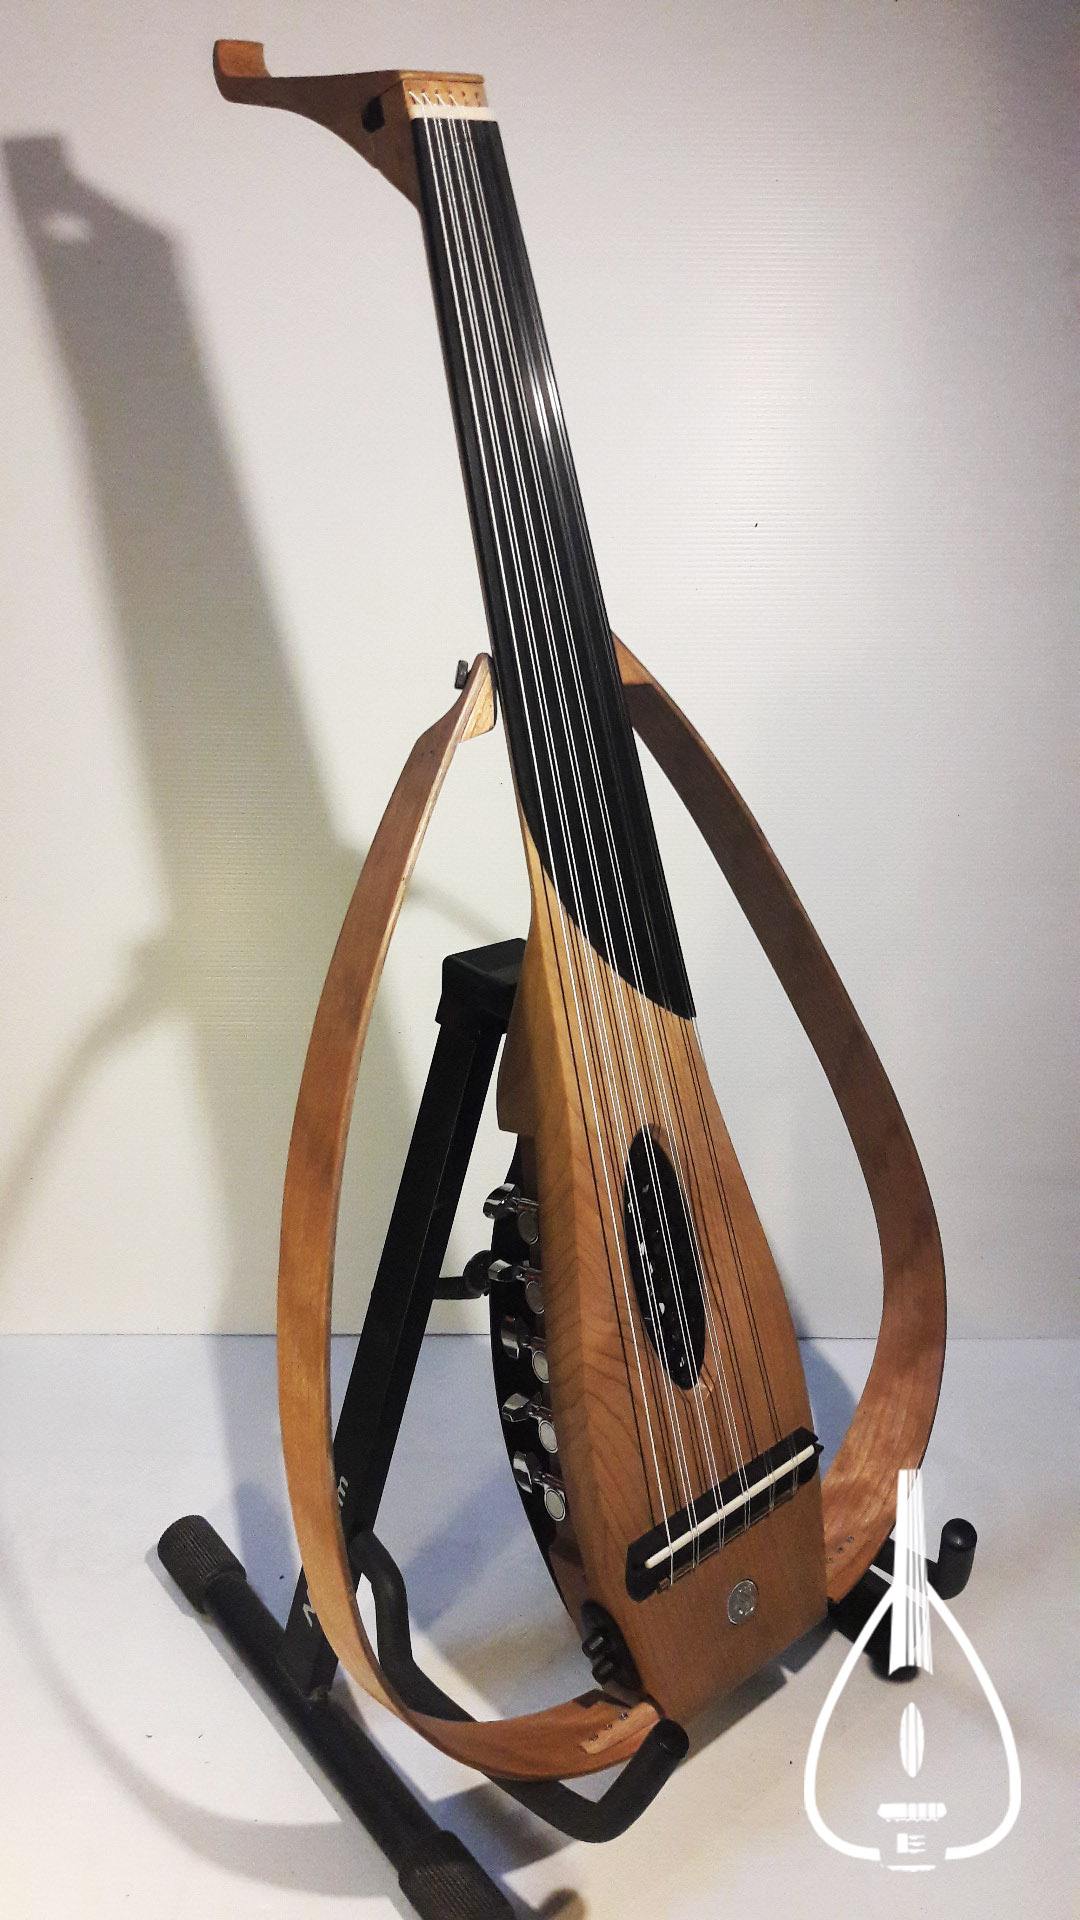 Sylent-oud v3 wood hoops profil